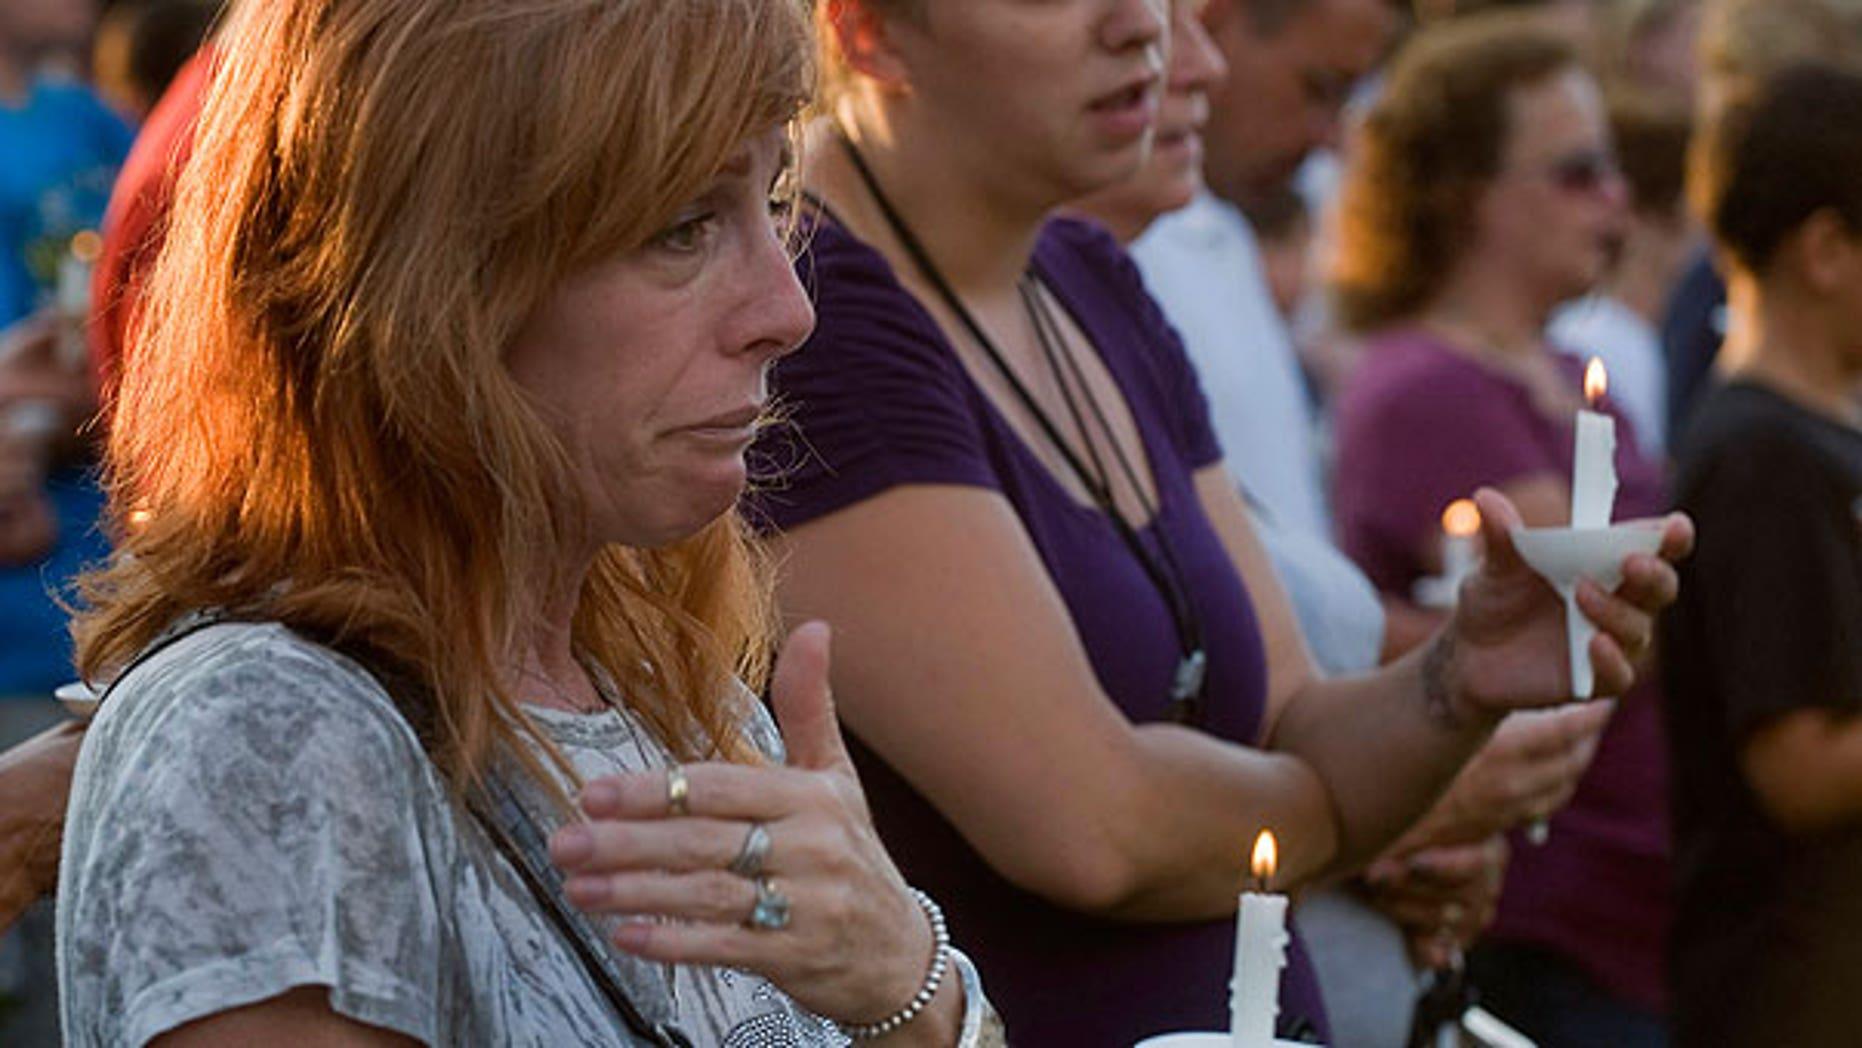 Aug. 7: Bambi Lynn of Fairlawn, Ohio, wipes away tears during a prayer vigil at Copley Community Park in Copley Township, Ohio.